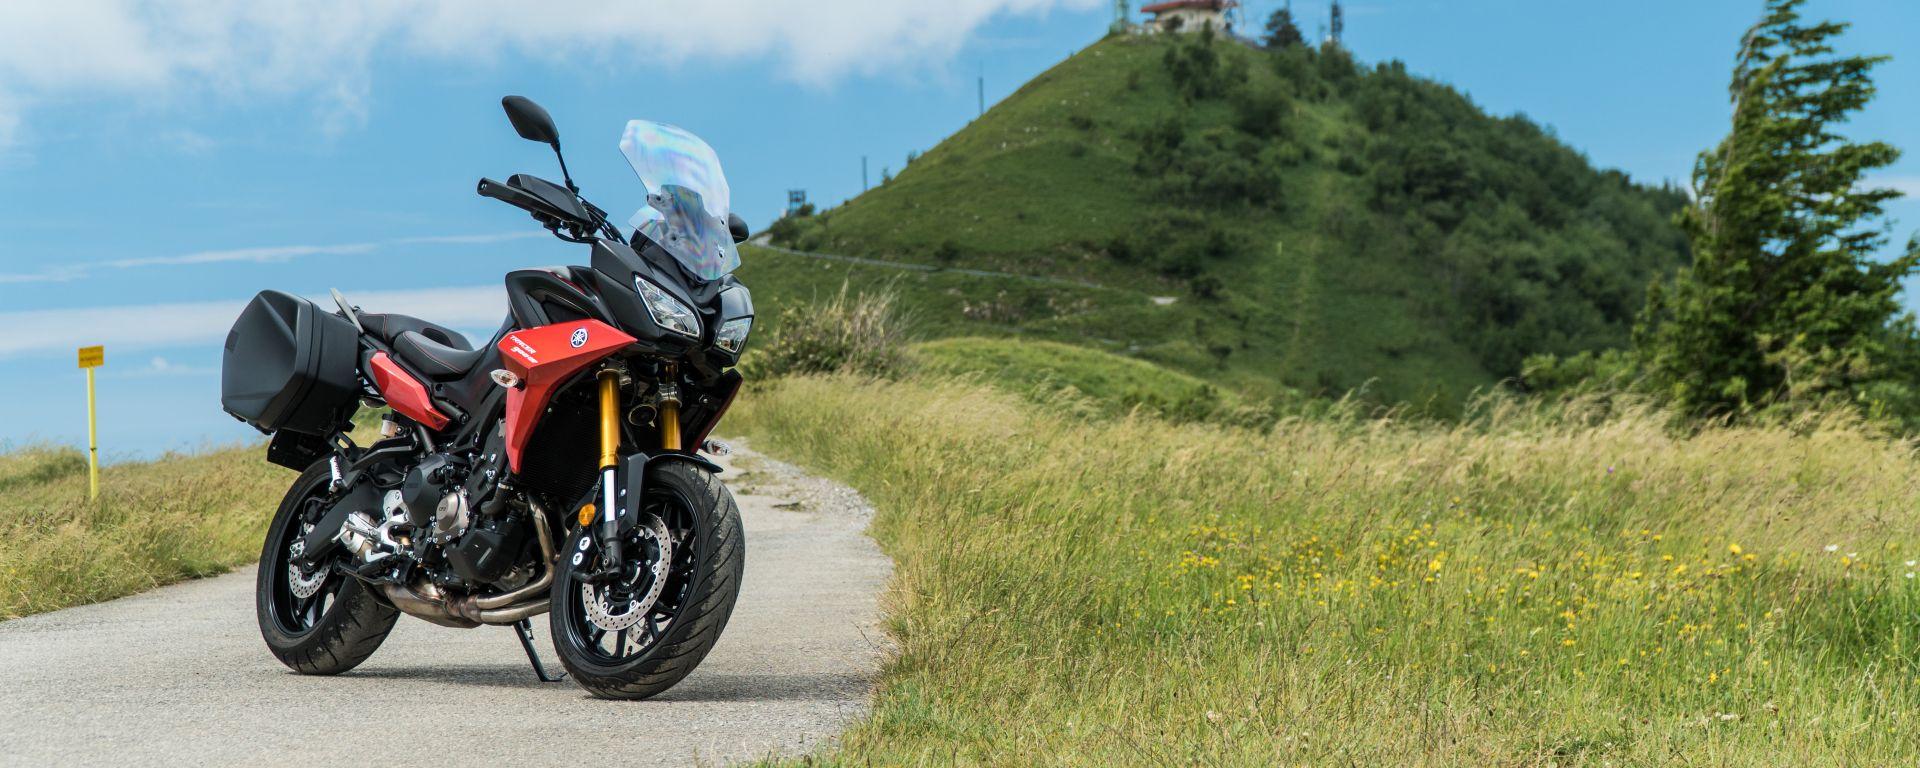 Comparativa Crossover: Yamaha Tracer 900 GT